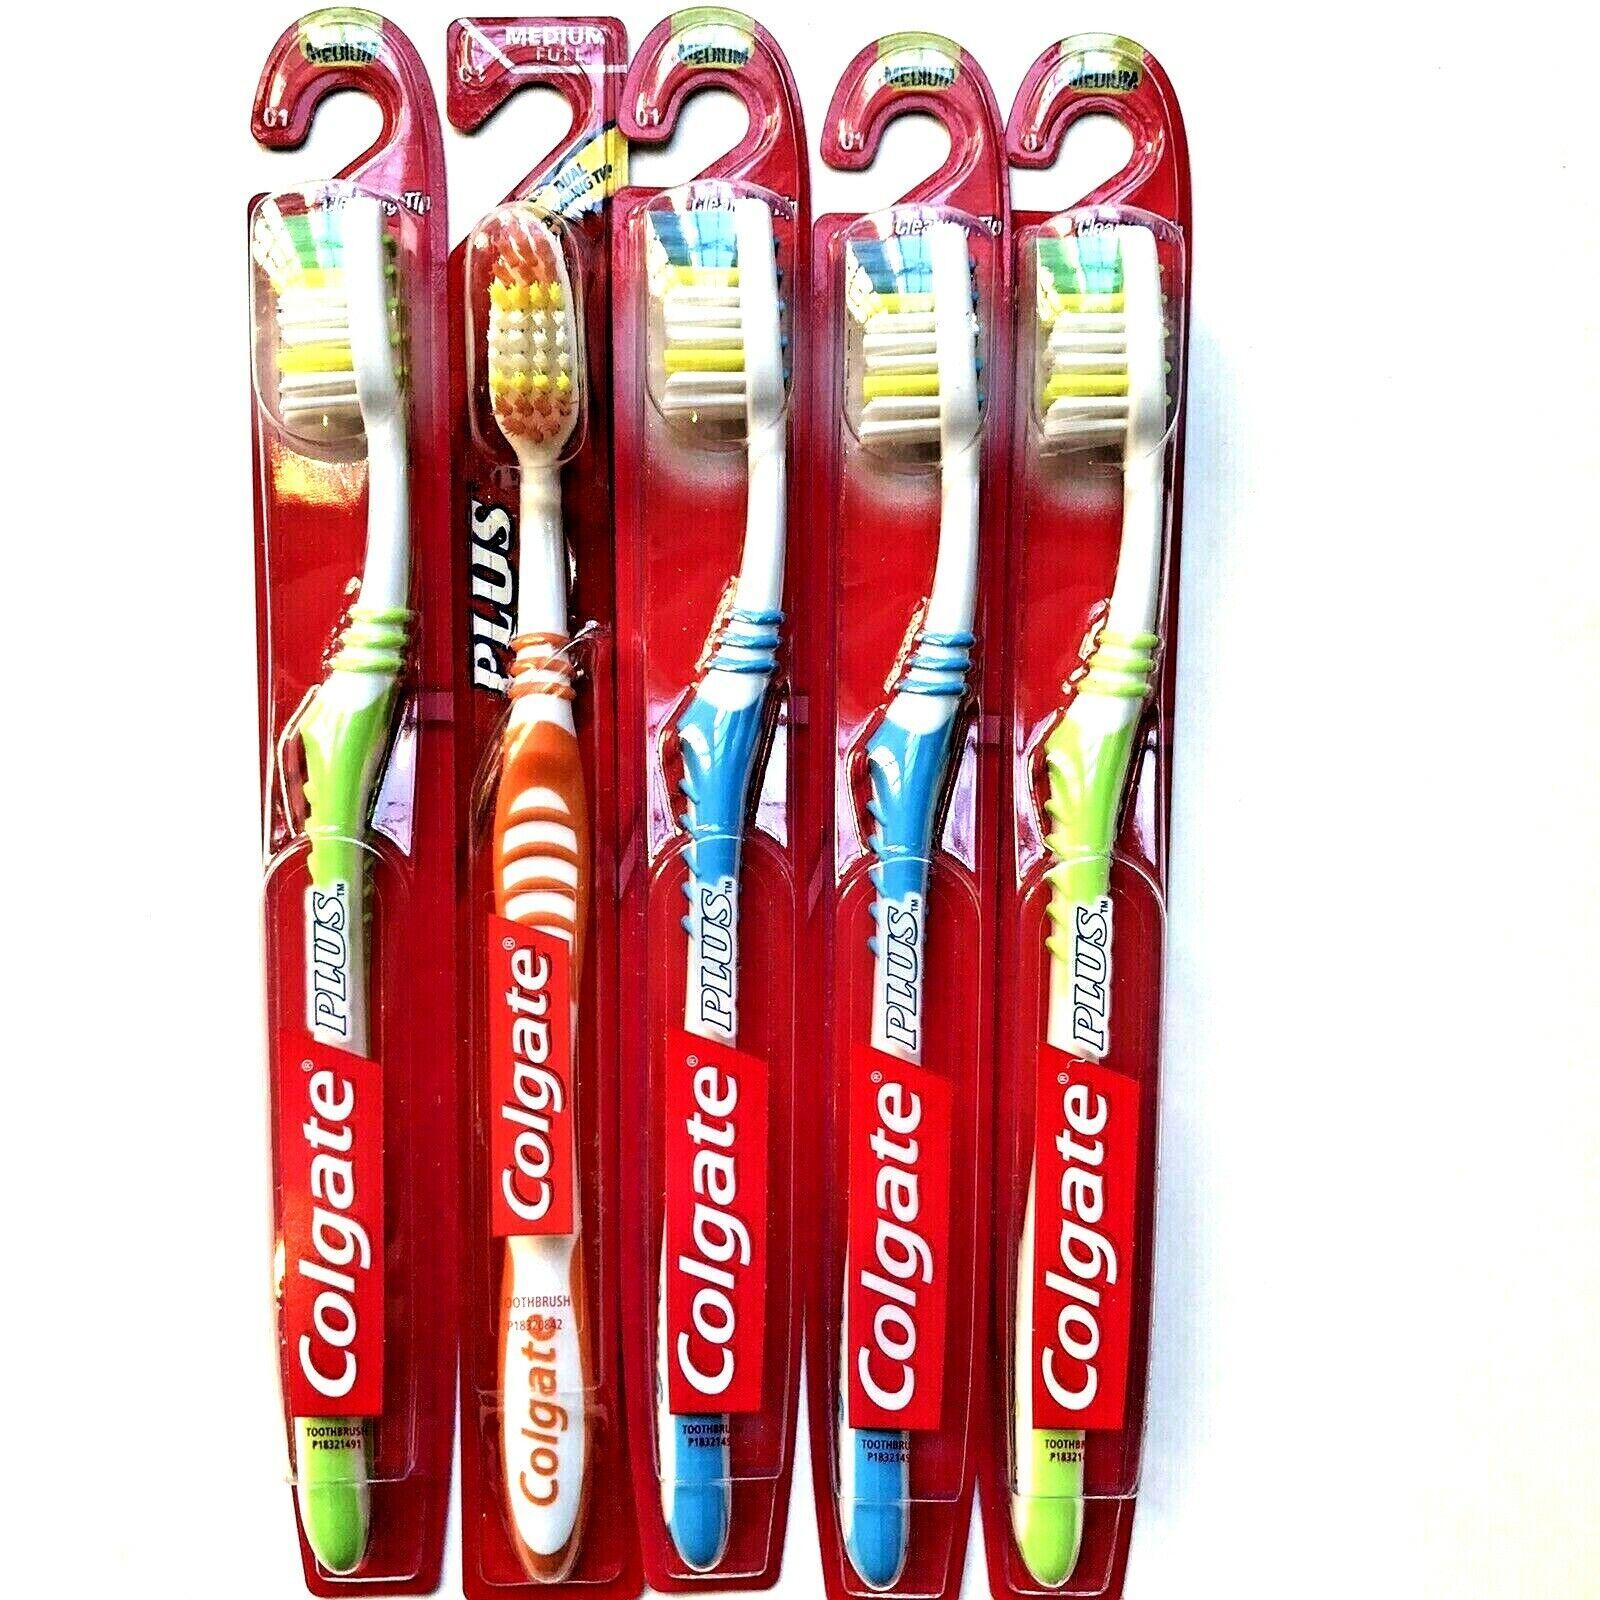 Colgate Plus Dual Cleaning Tip, Medium Full Head Toothbrush,